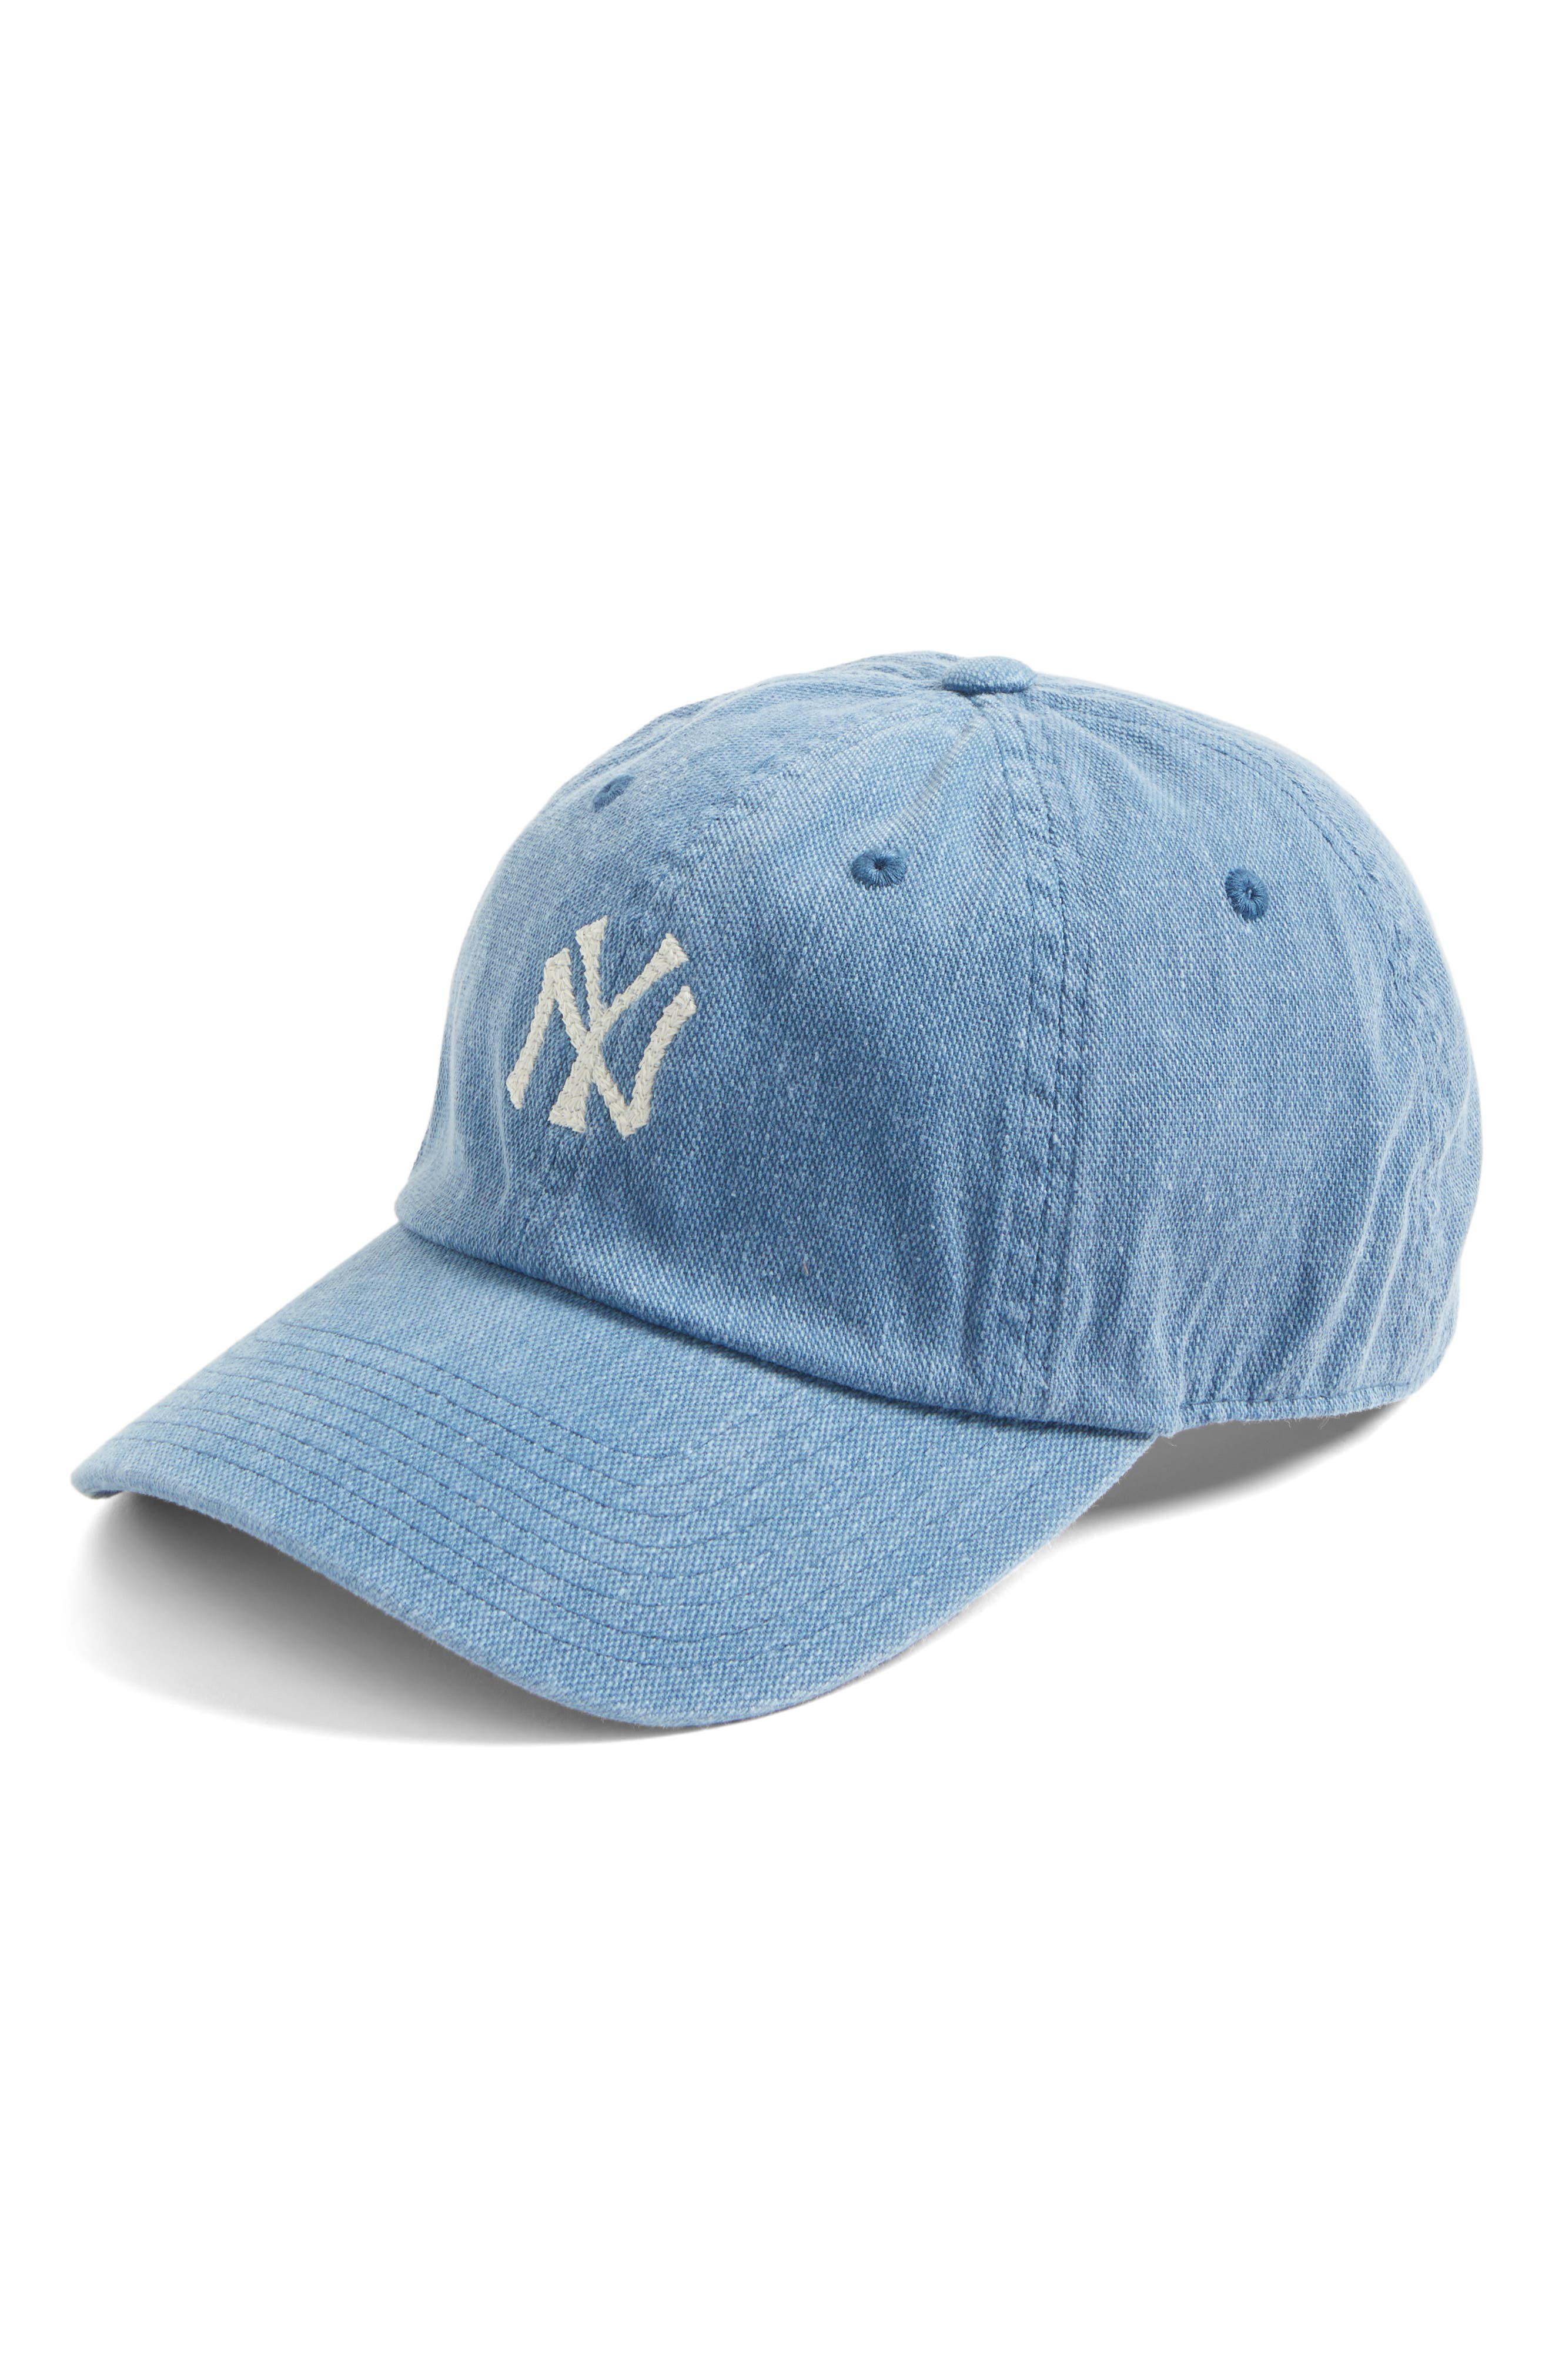 Main Image - American Needle Danbury New York Yankees Baseball Cap